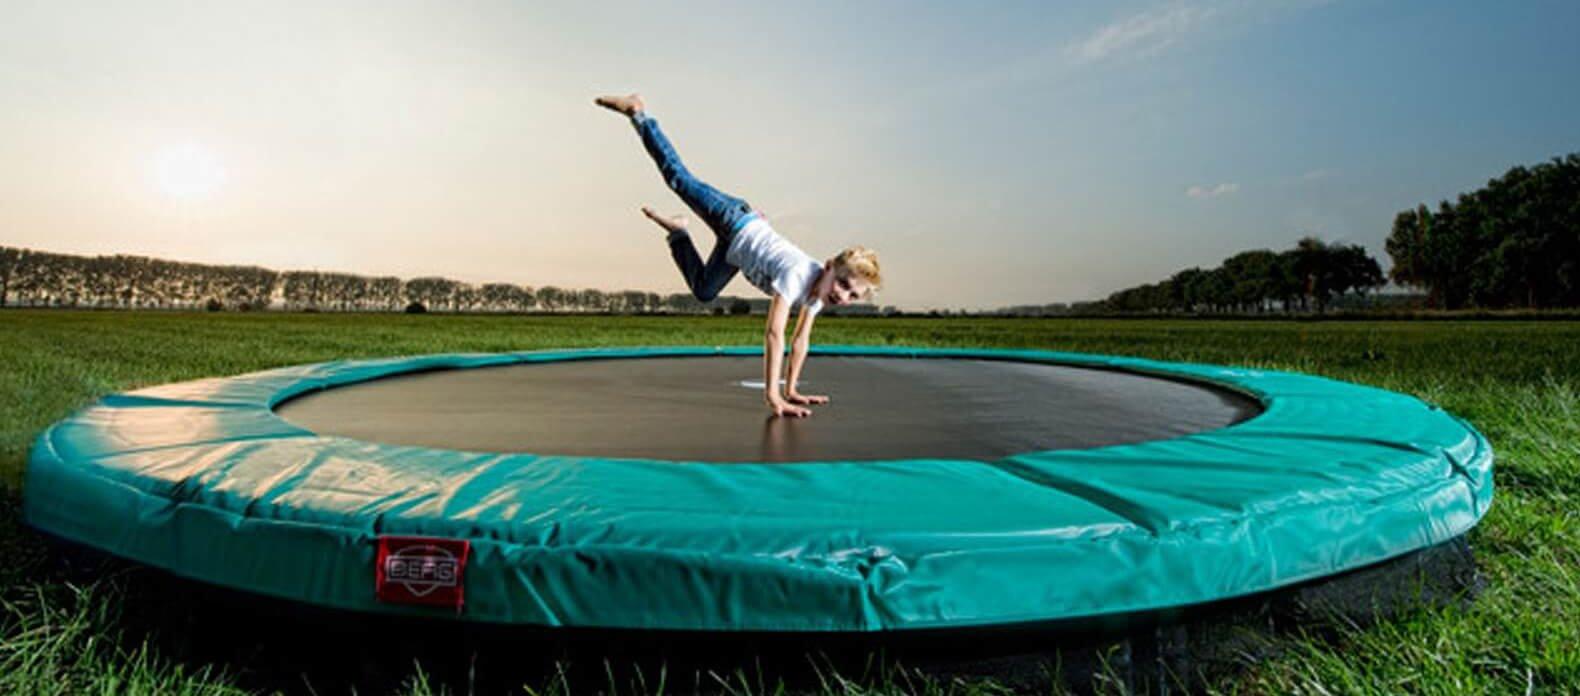 Alles zur Trampolin Sicherheit - trampolin-profi.de Ratgeber